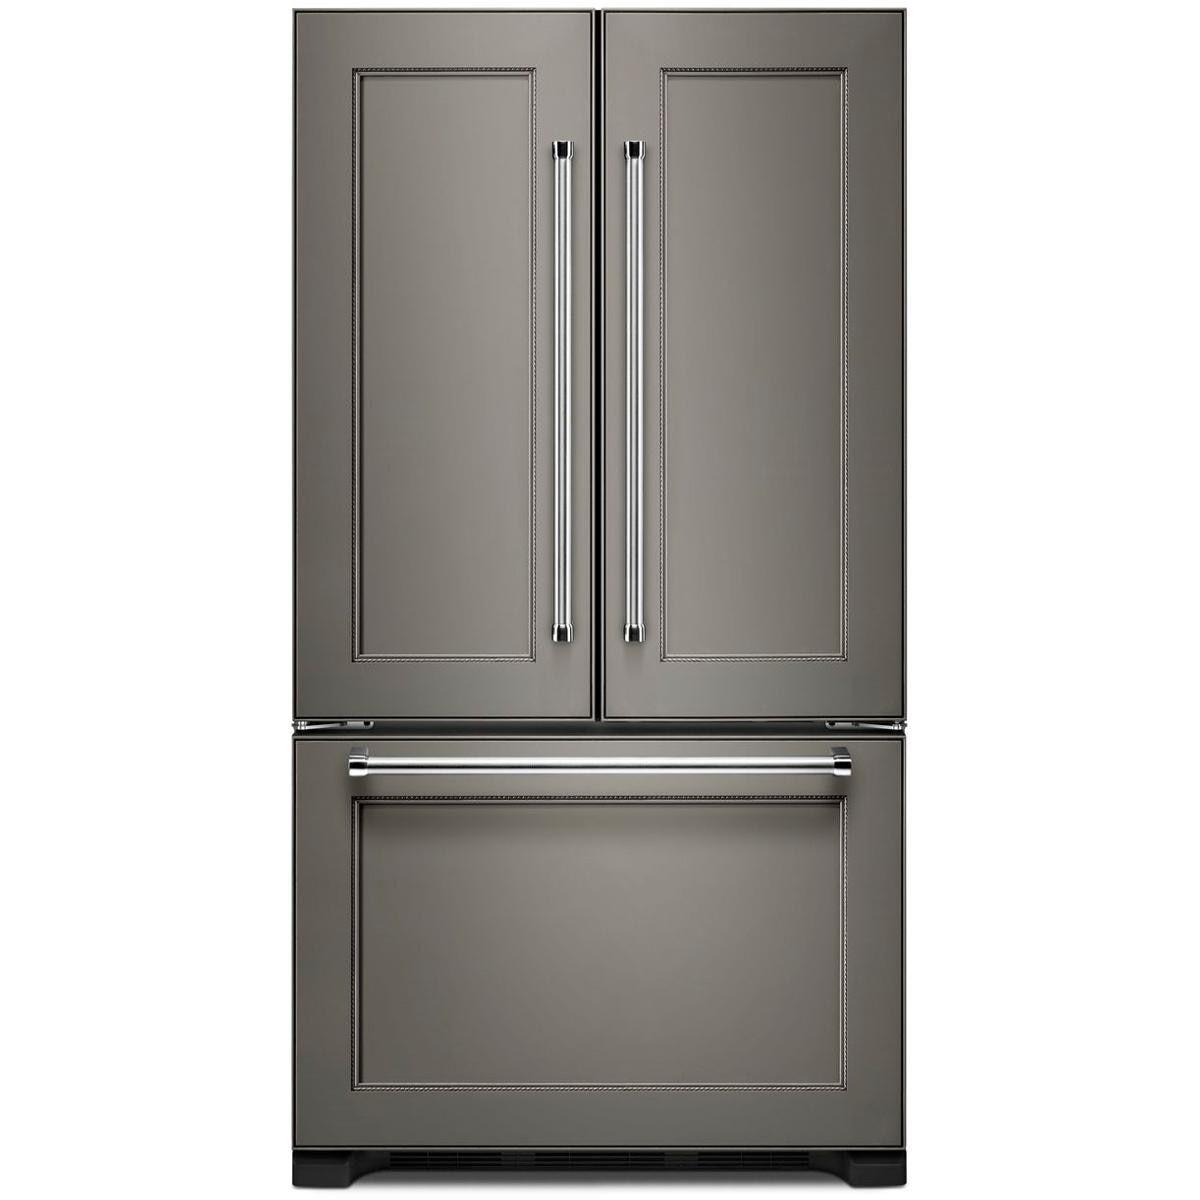 Kitchenaid 22 cu ft 36 wide counter depth panel ready